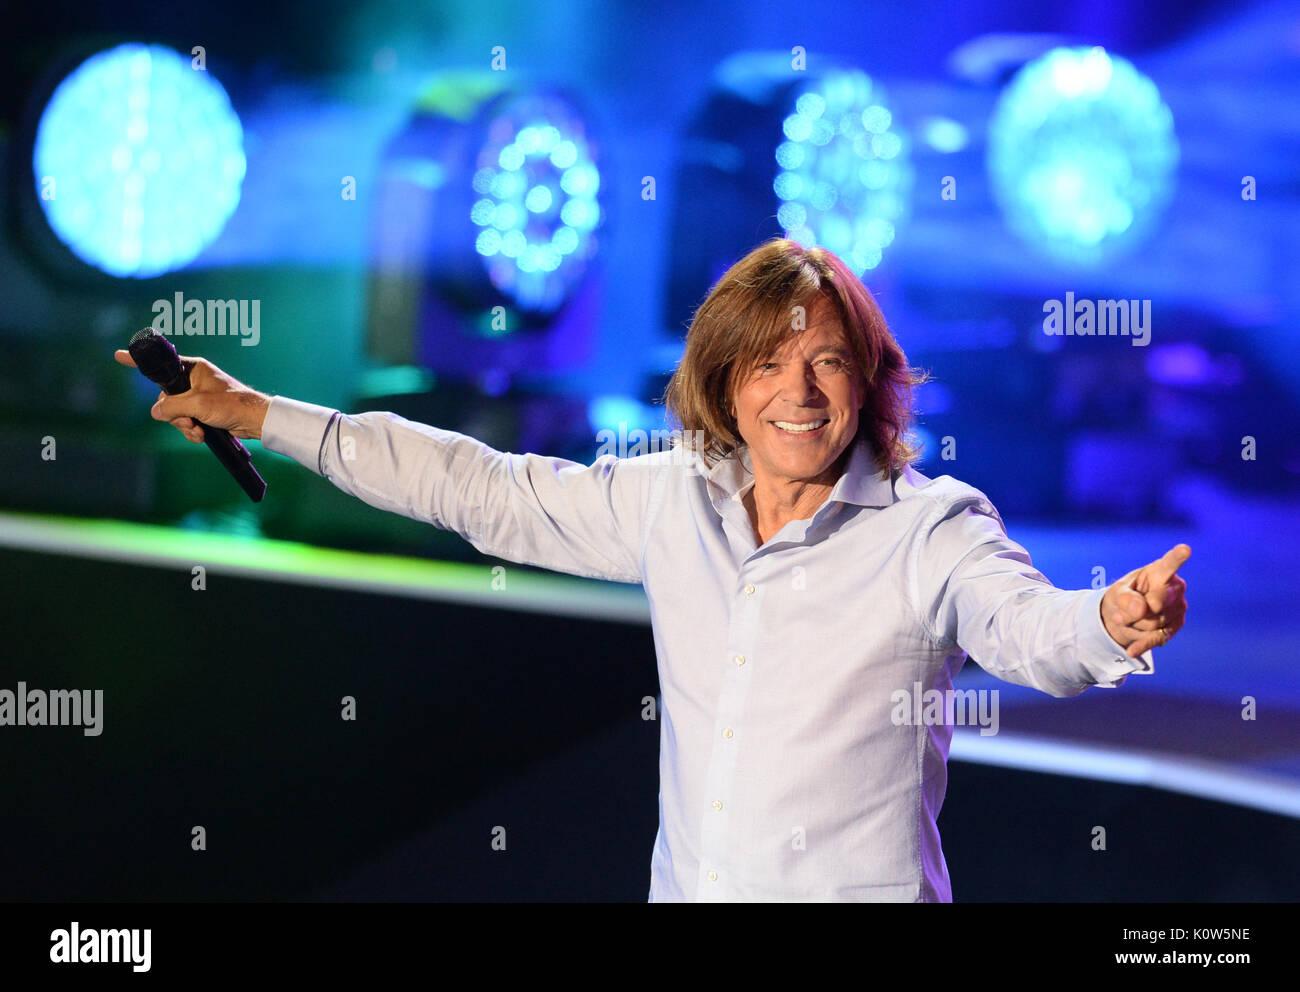 Singer Jurgen Drews standing onstage during the ZDF Summer